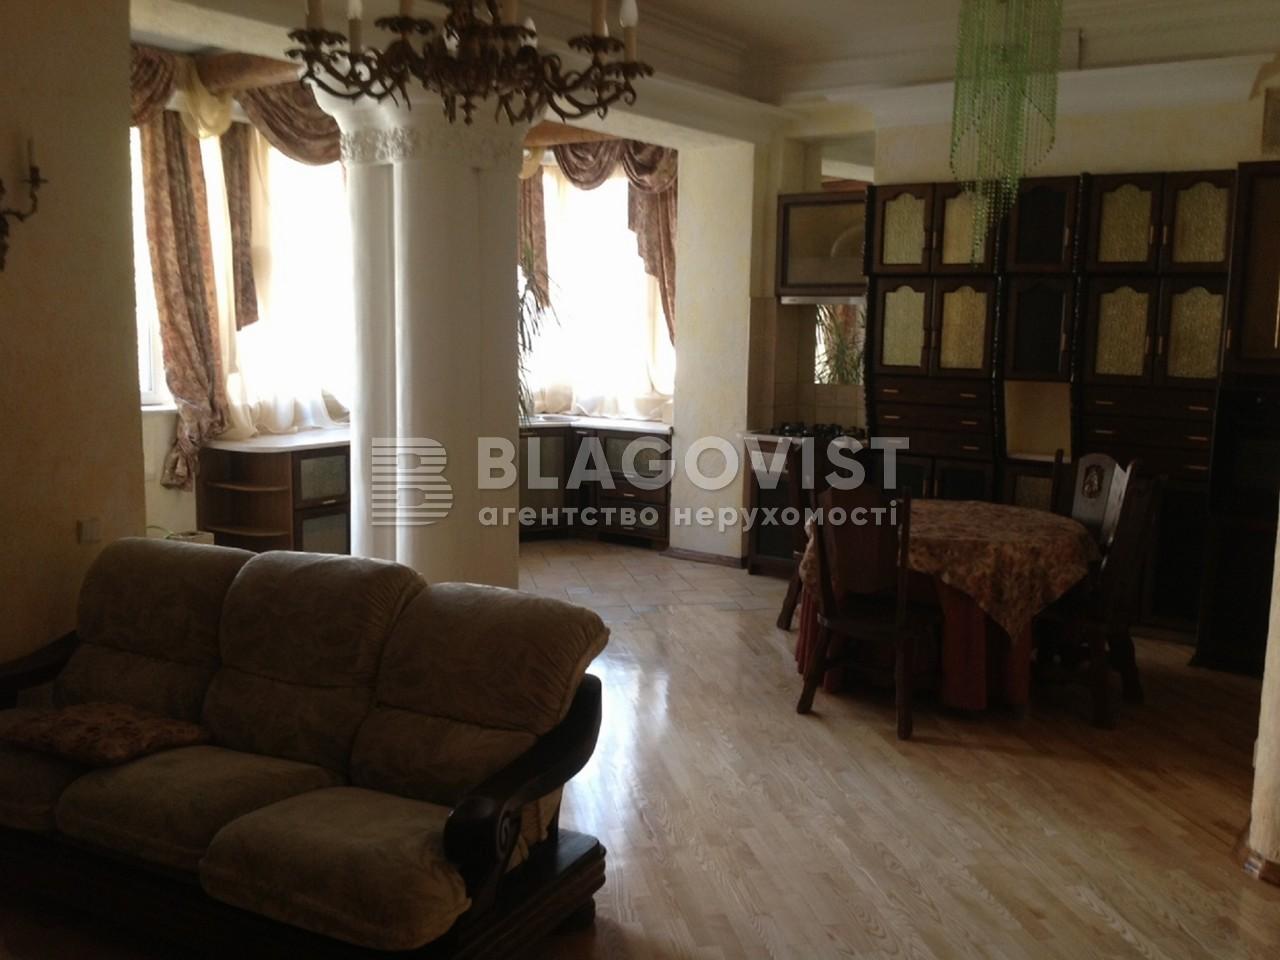 Квартира I-9864, Стратегическое шоссе, 35, Киев - Фото 1